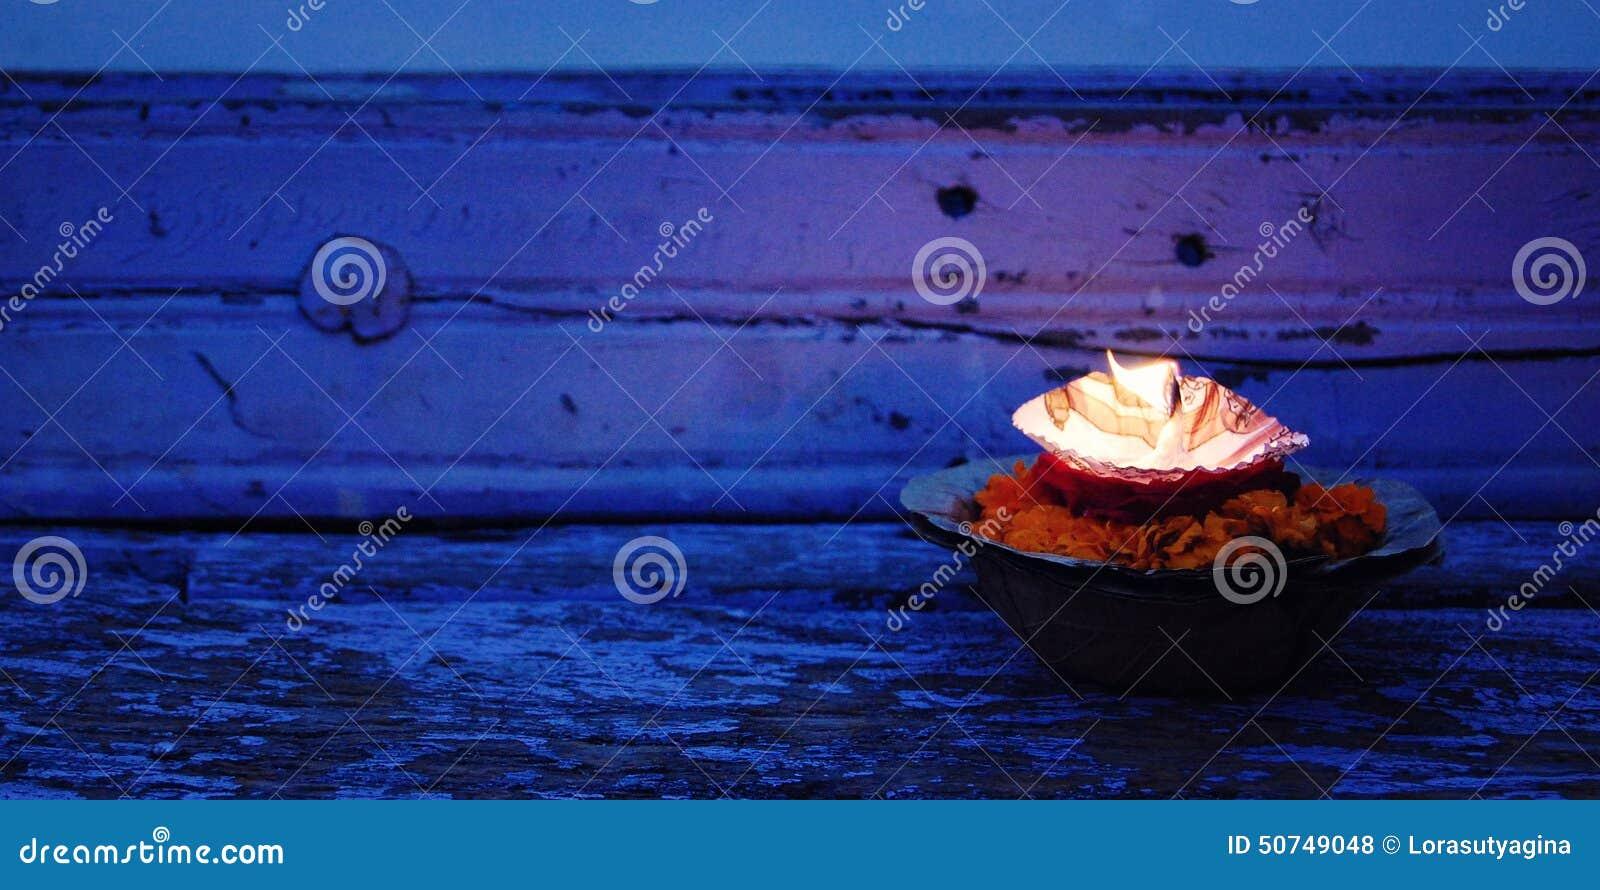 Hinduism religious ceremony puja flowers and candle near river Ganga, Varanasi, Uttar Pradesh, India.